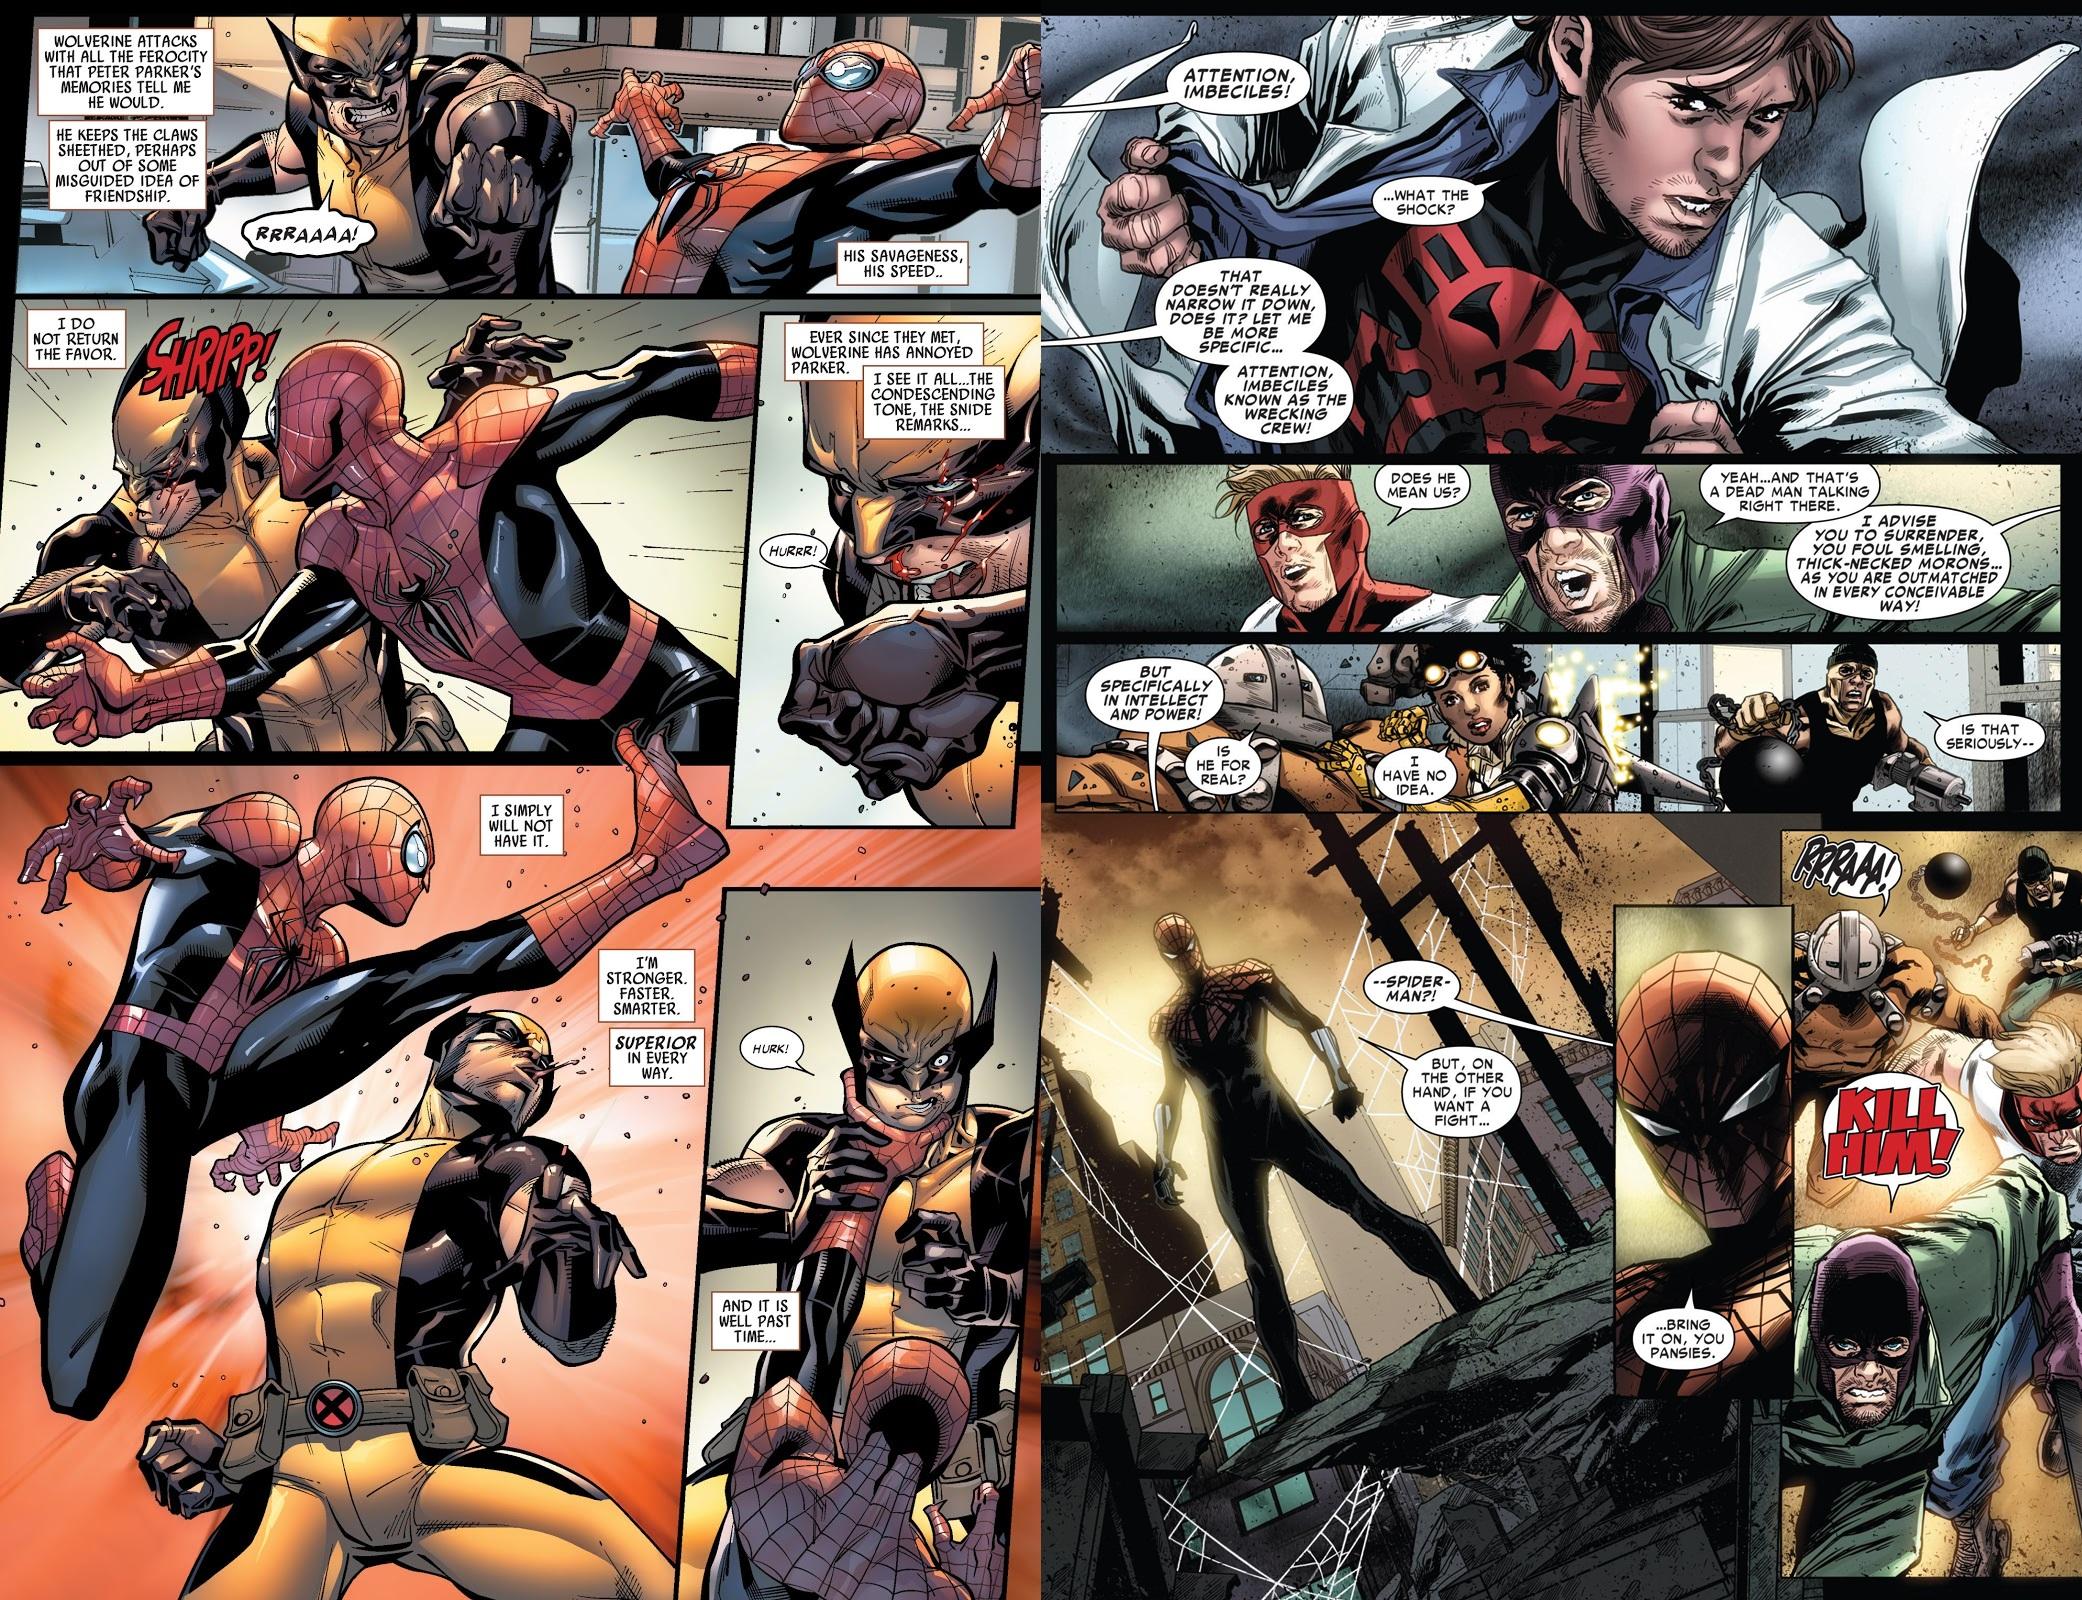 Superior Spider-Man Team-Up Superiority Complex review